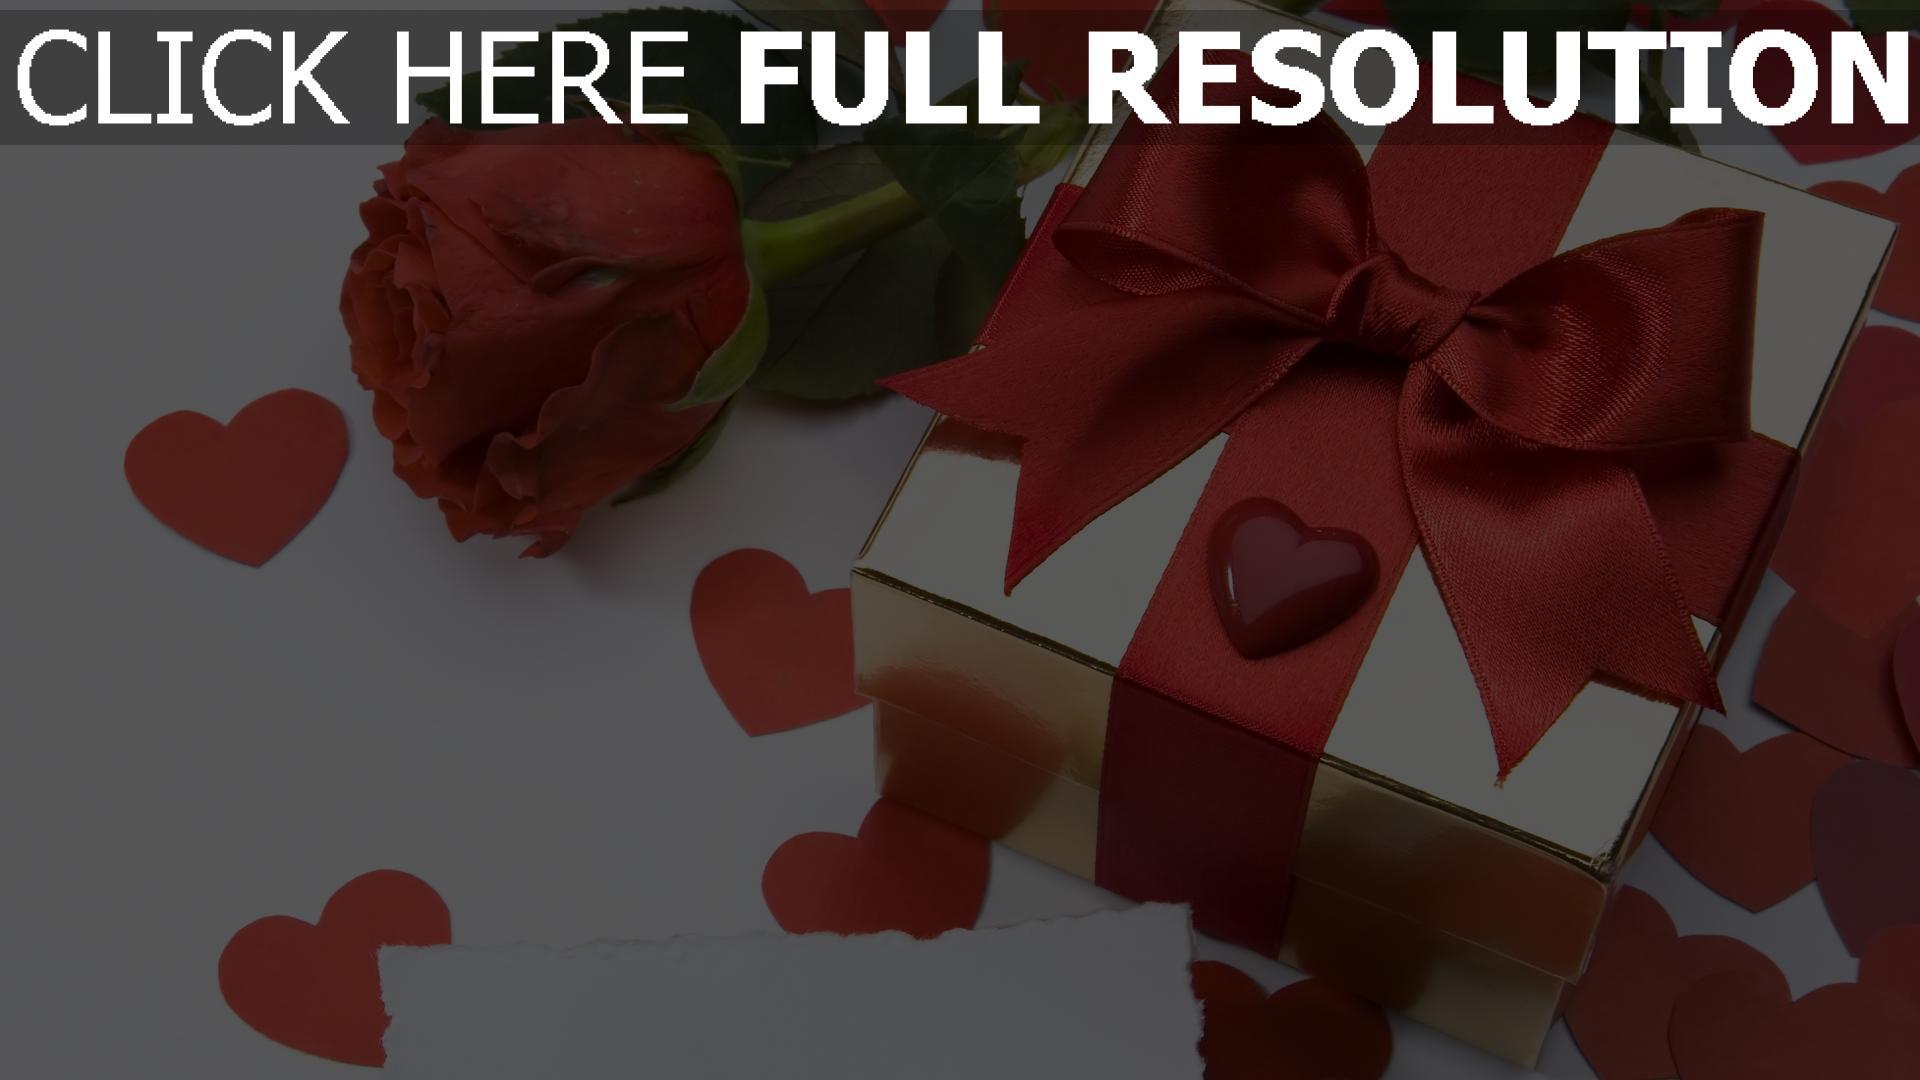 hd hintergrundbilder bogen rose herz geschenk romantik 1920x1080